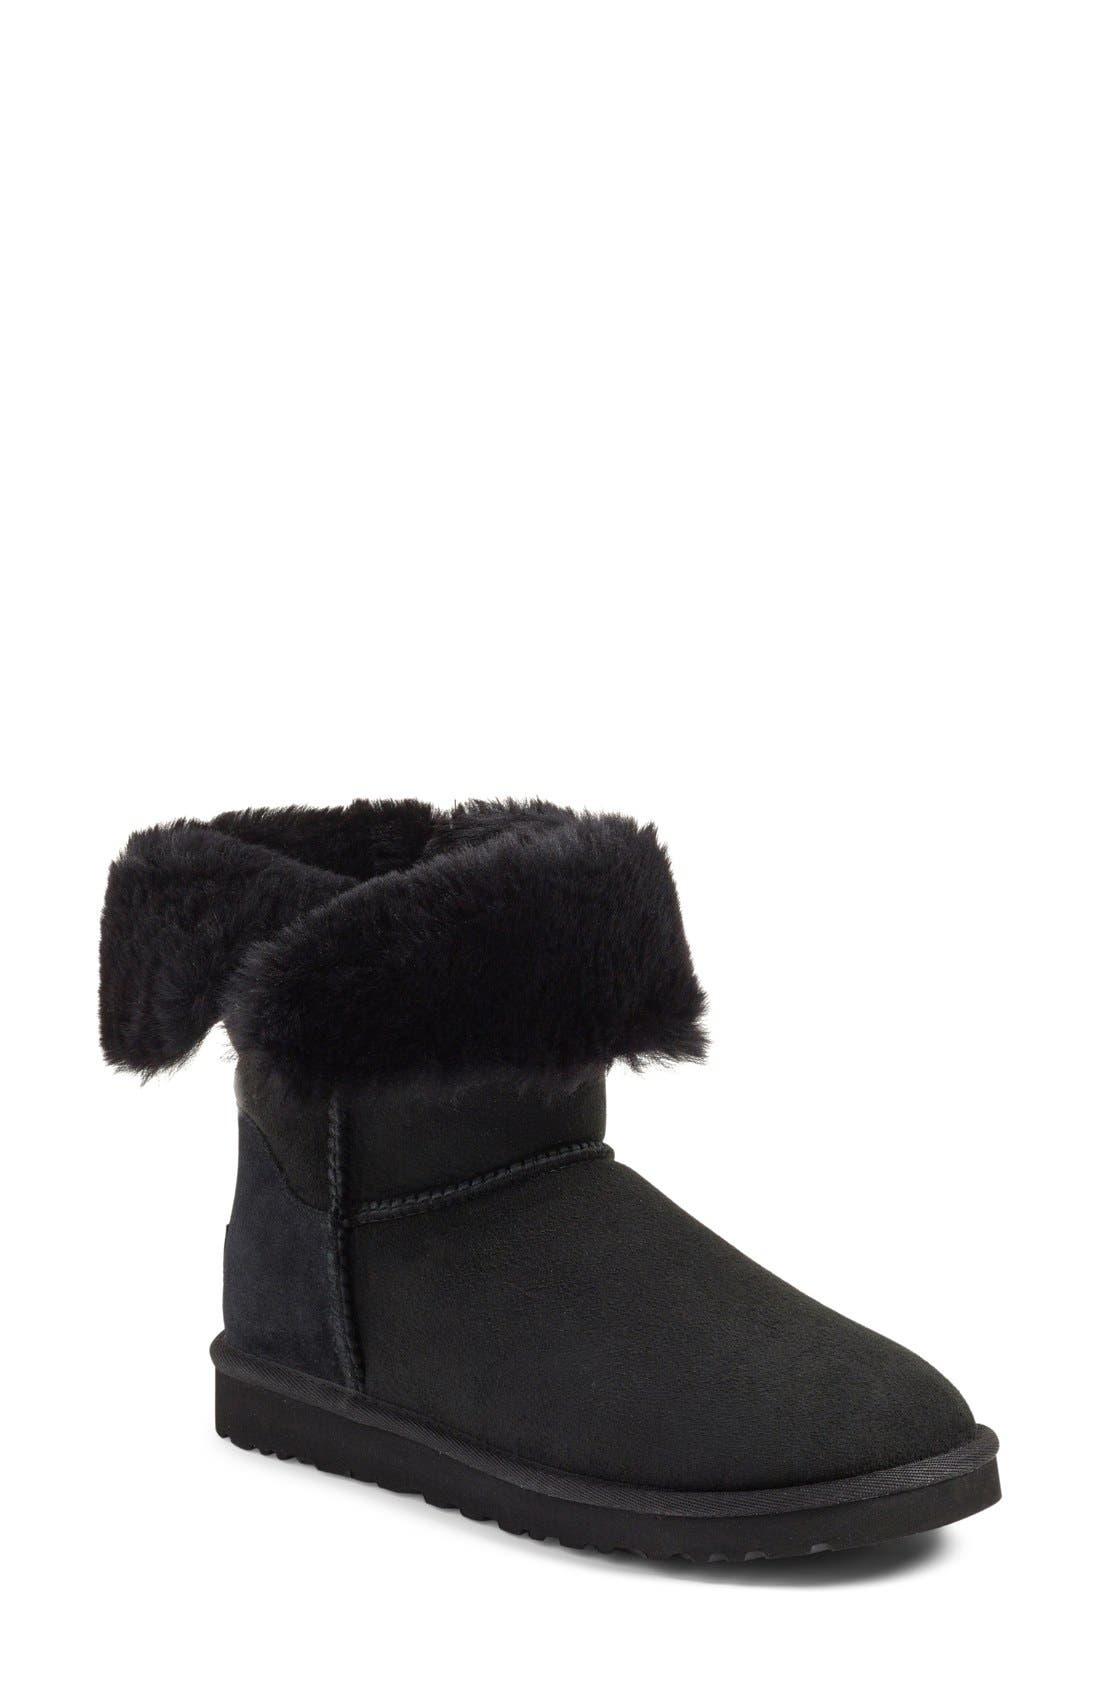 UGG<SUP>®</SUP>, Nash Genuine Shearling Boot, Alternate thumbnail 5, color, 001